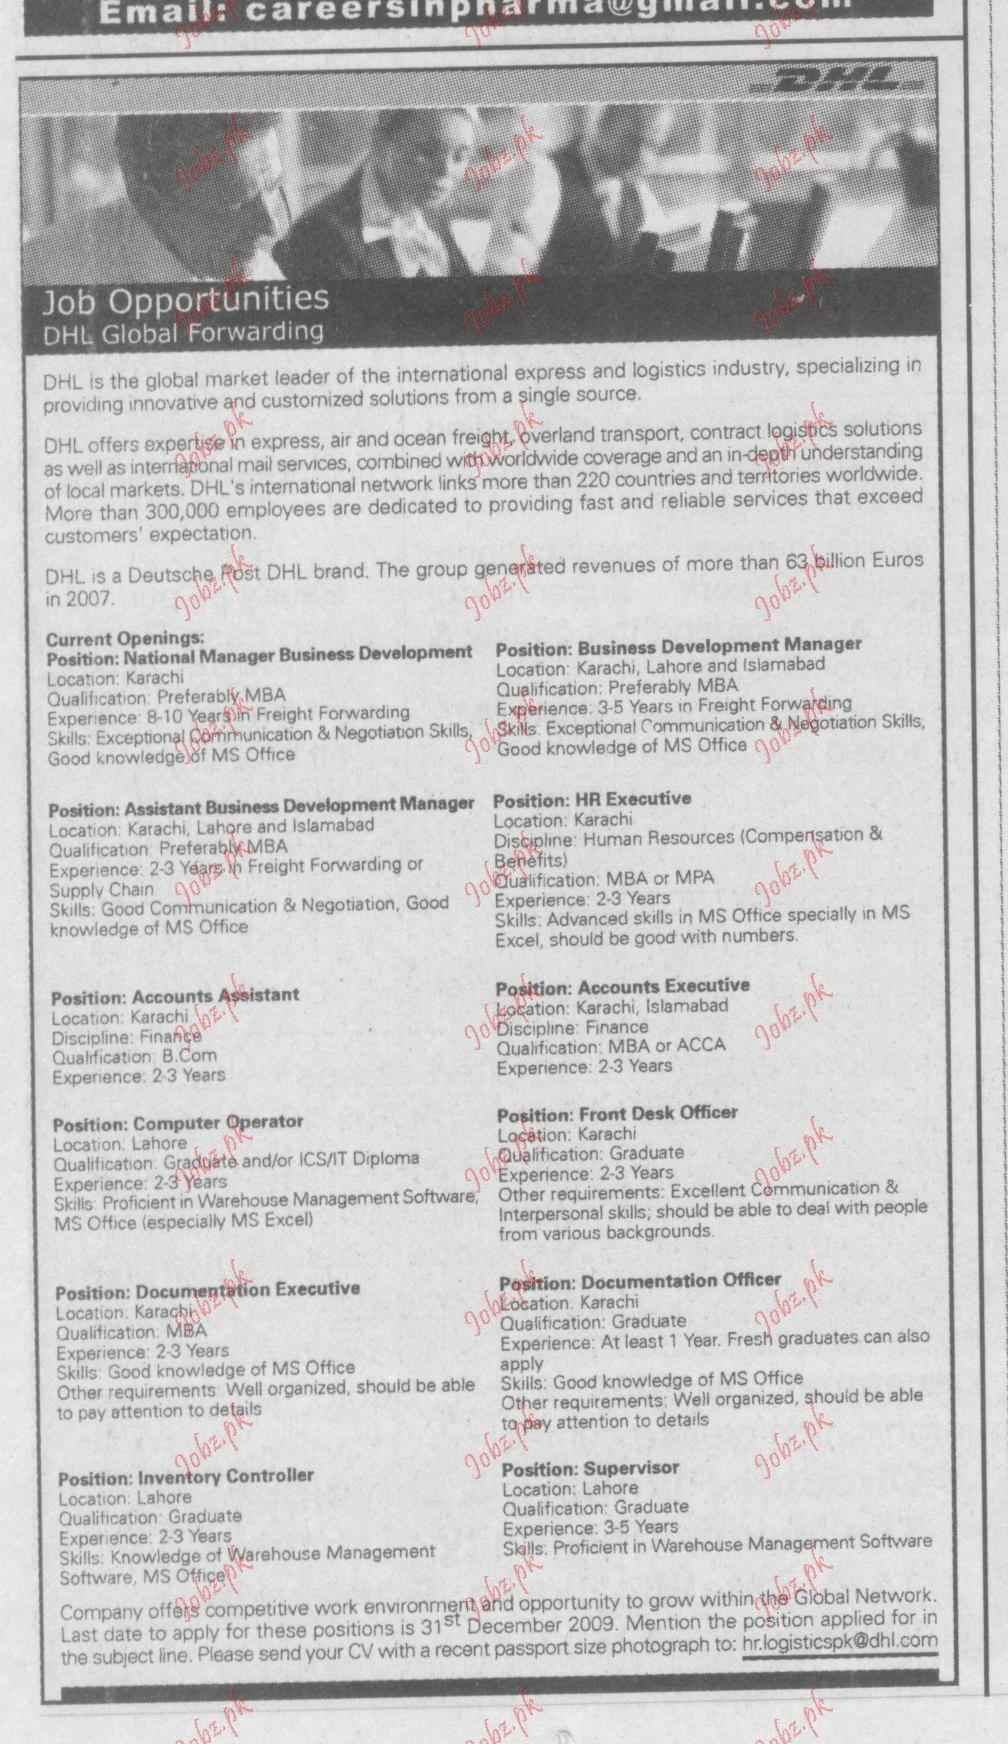 DHL Global Forwarding company jobs 2019 Job Advertisement